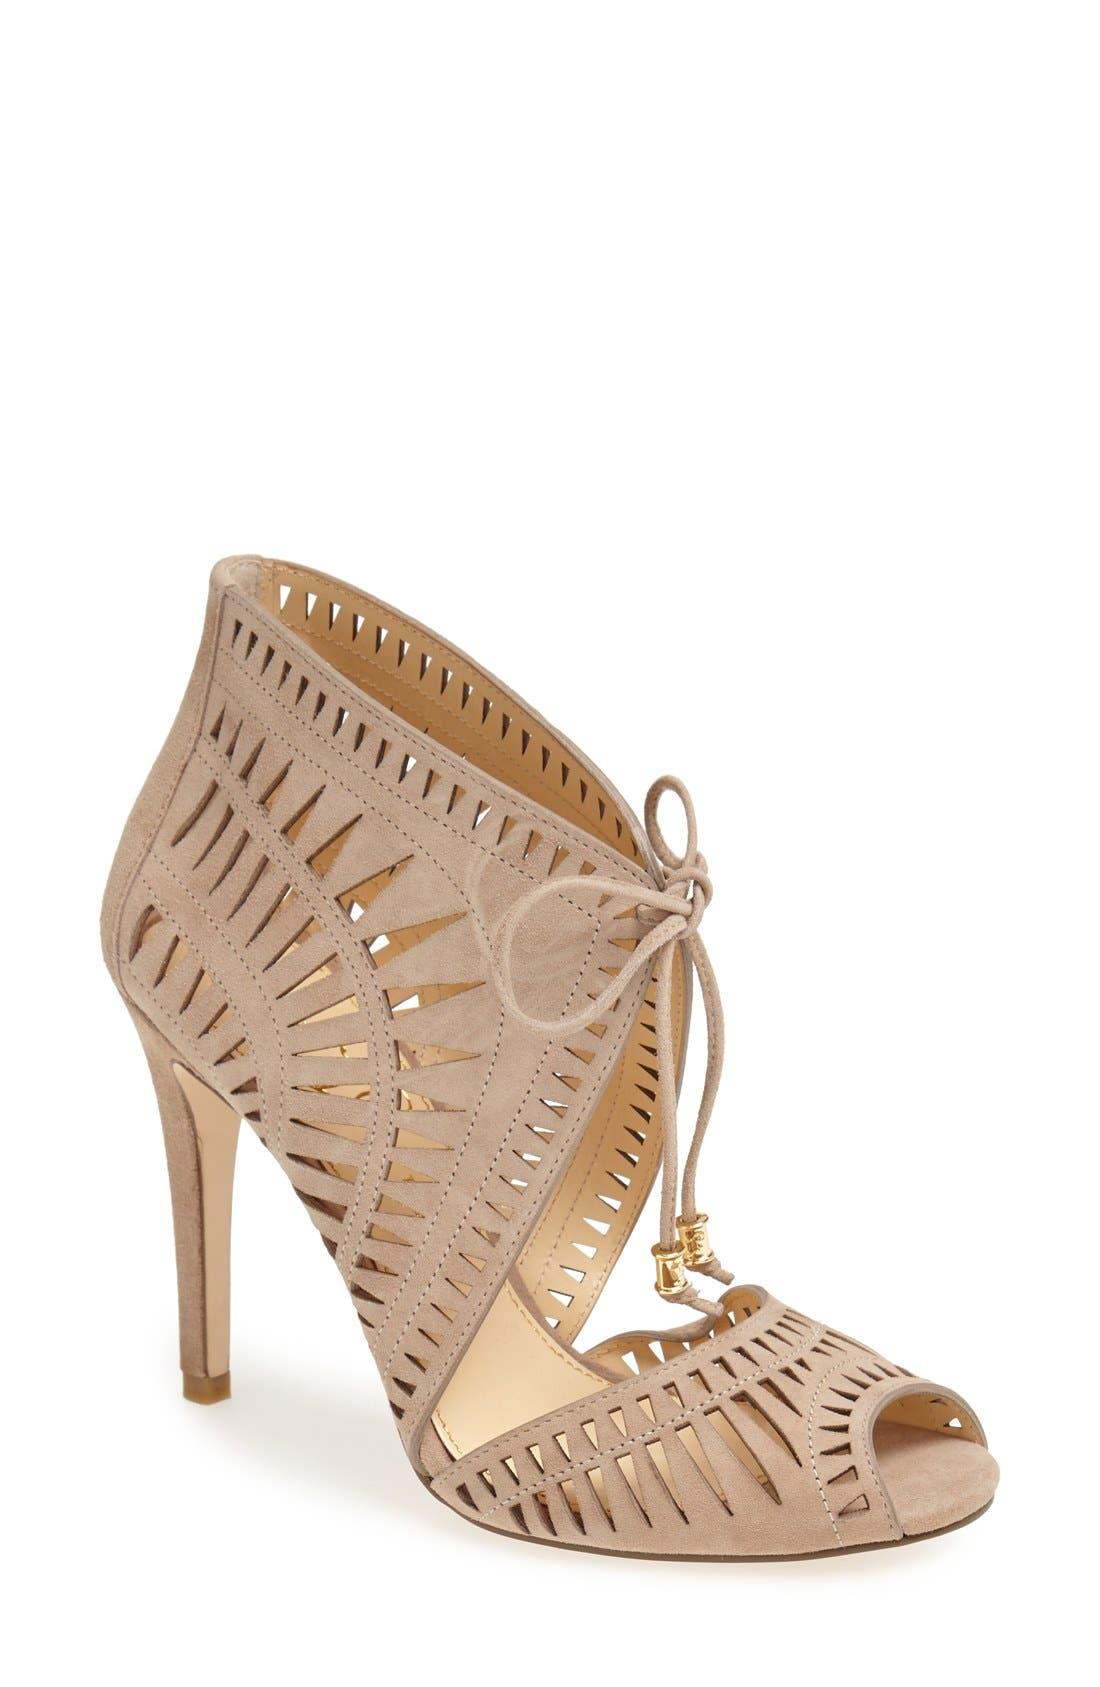 Alternate Image 1 Selected - Ivanka Trump 'Delfino' Sandal